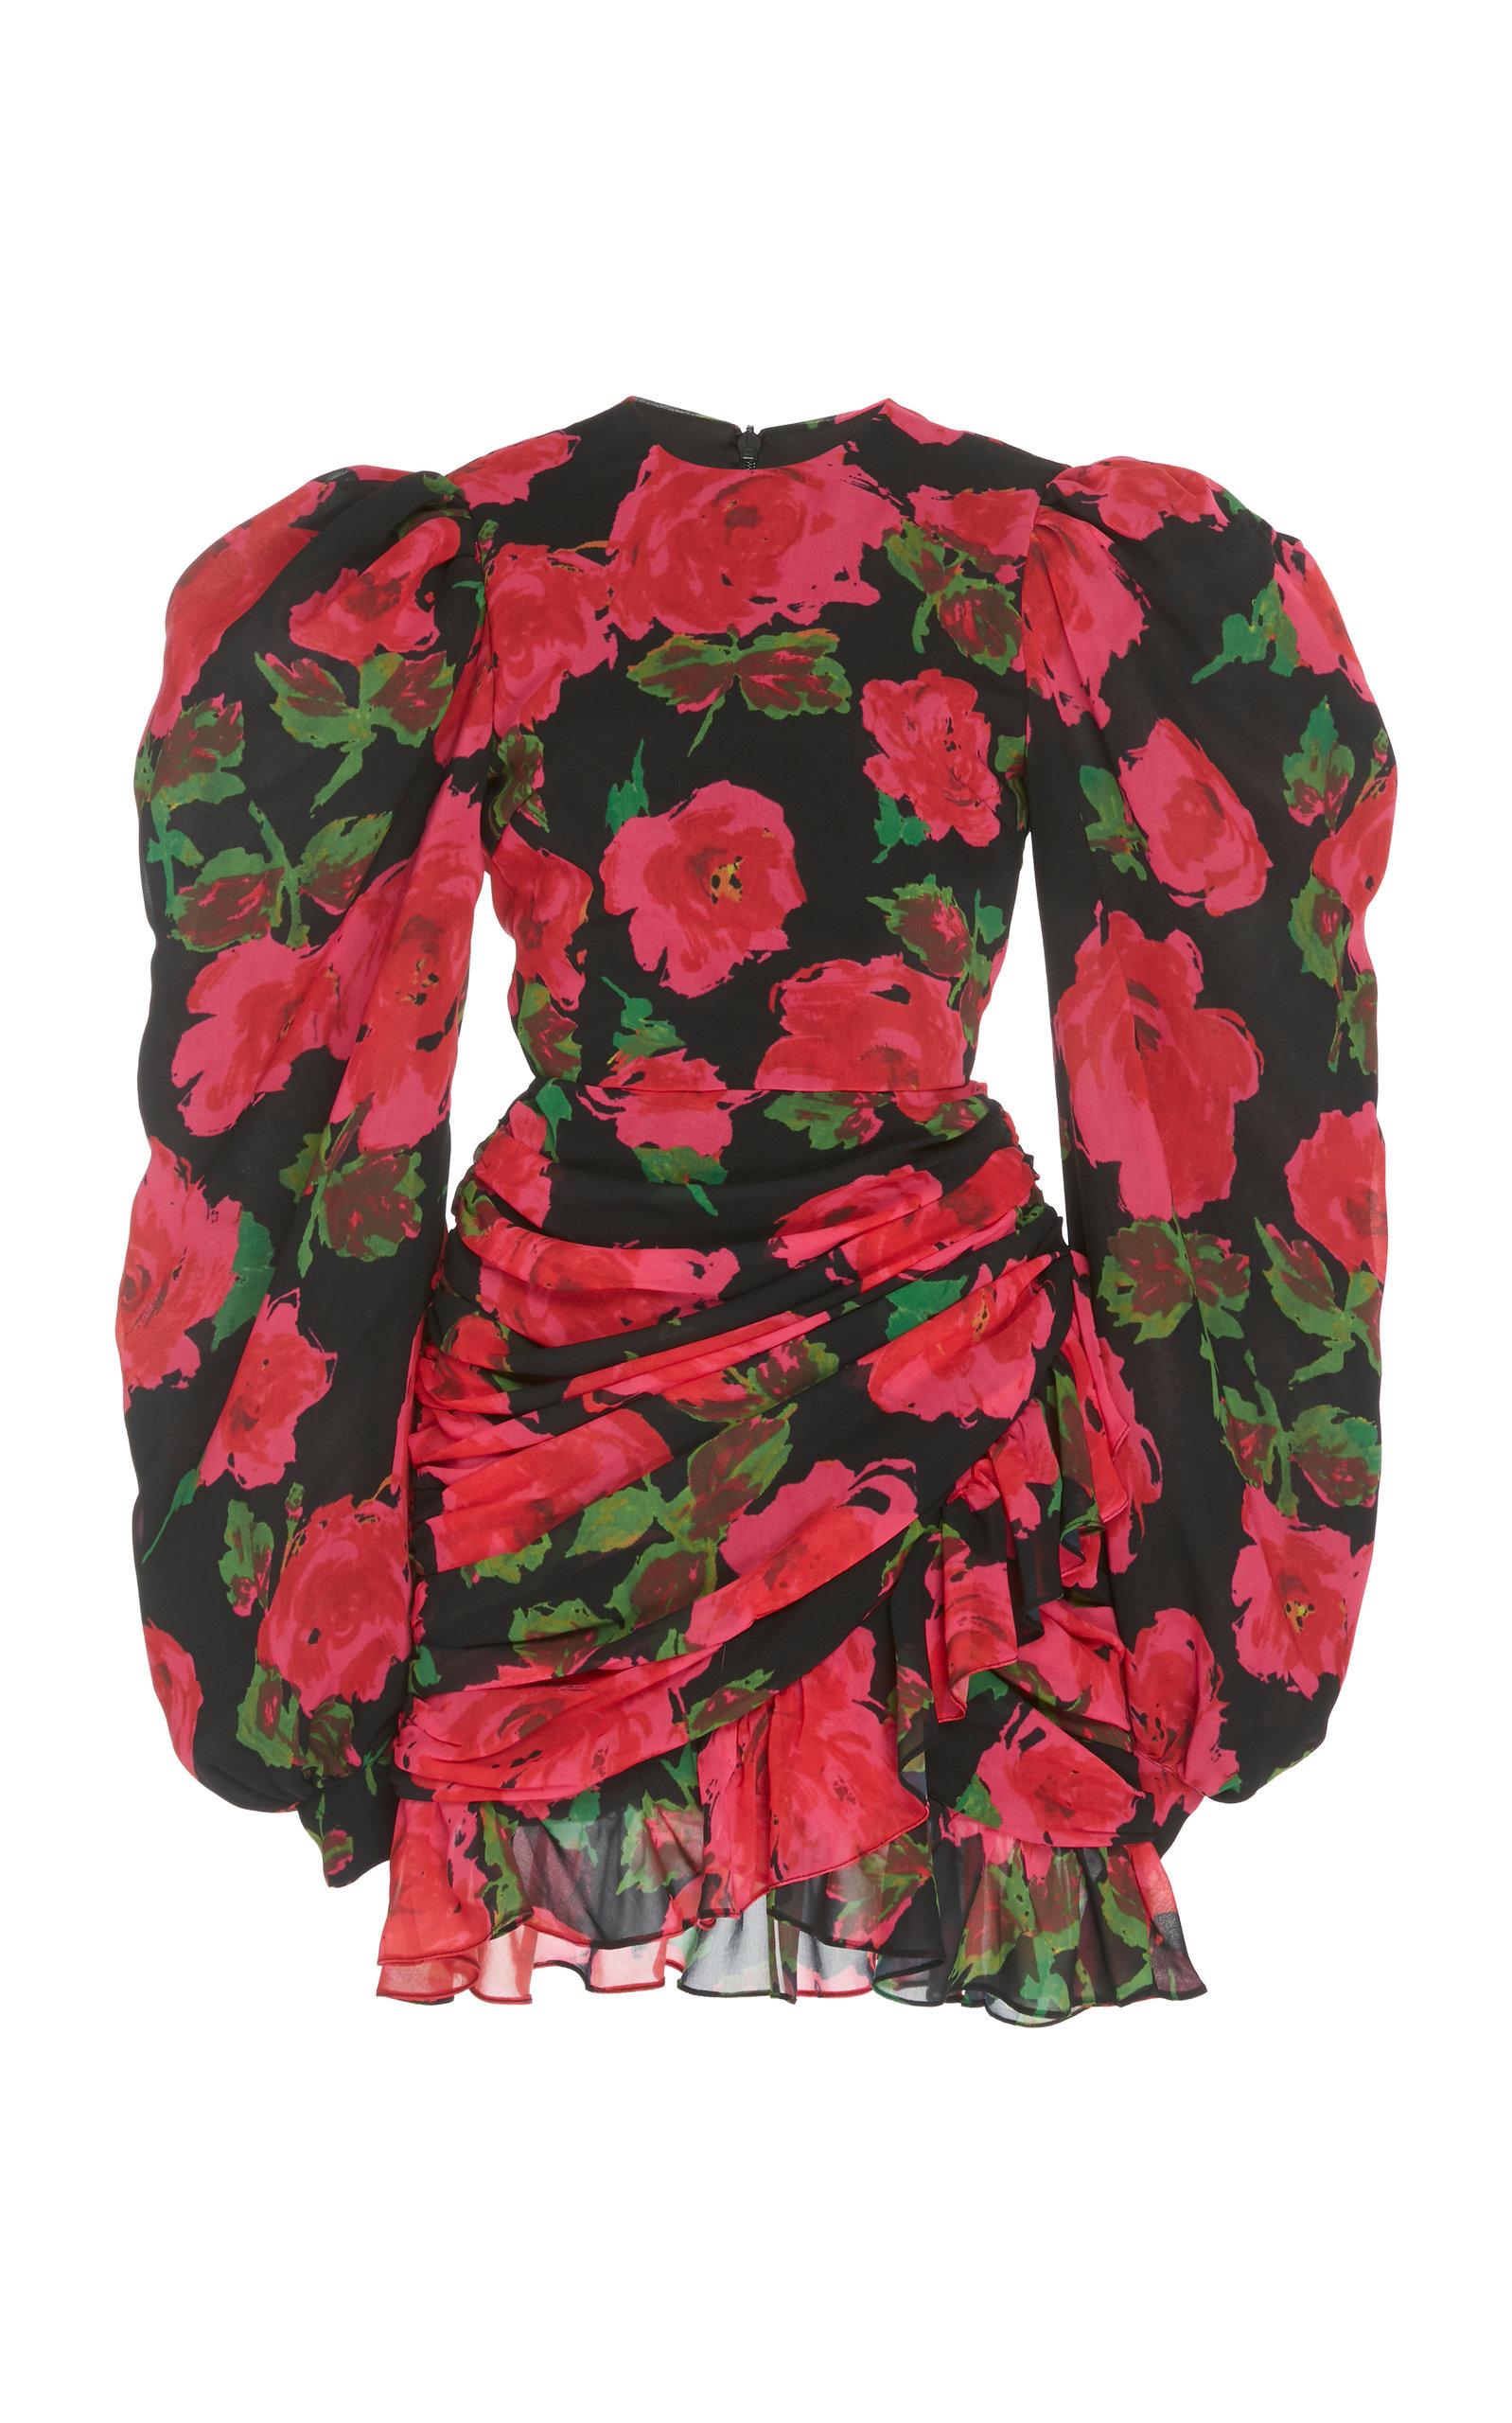 Buy Richard Quinn Ruched Floral-Print Chiffon Dress online, shop Richard Quinn at the best price